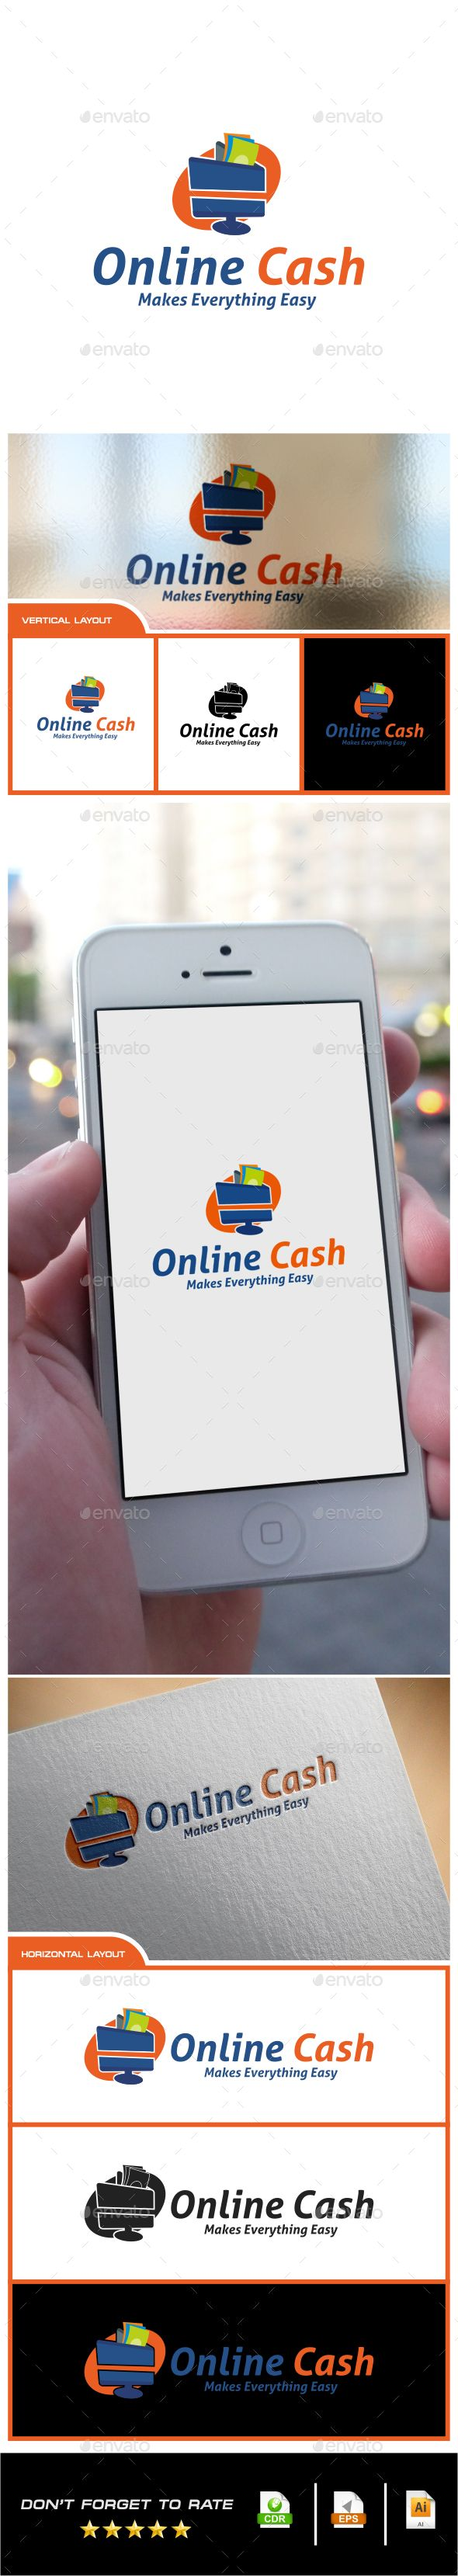 Online Cash Logo